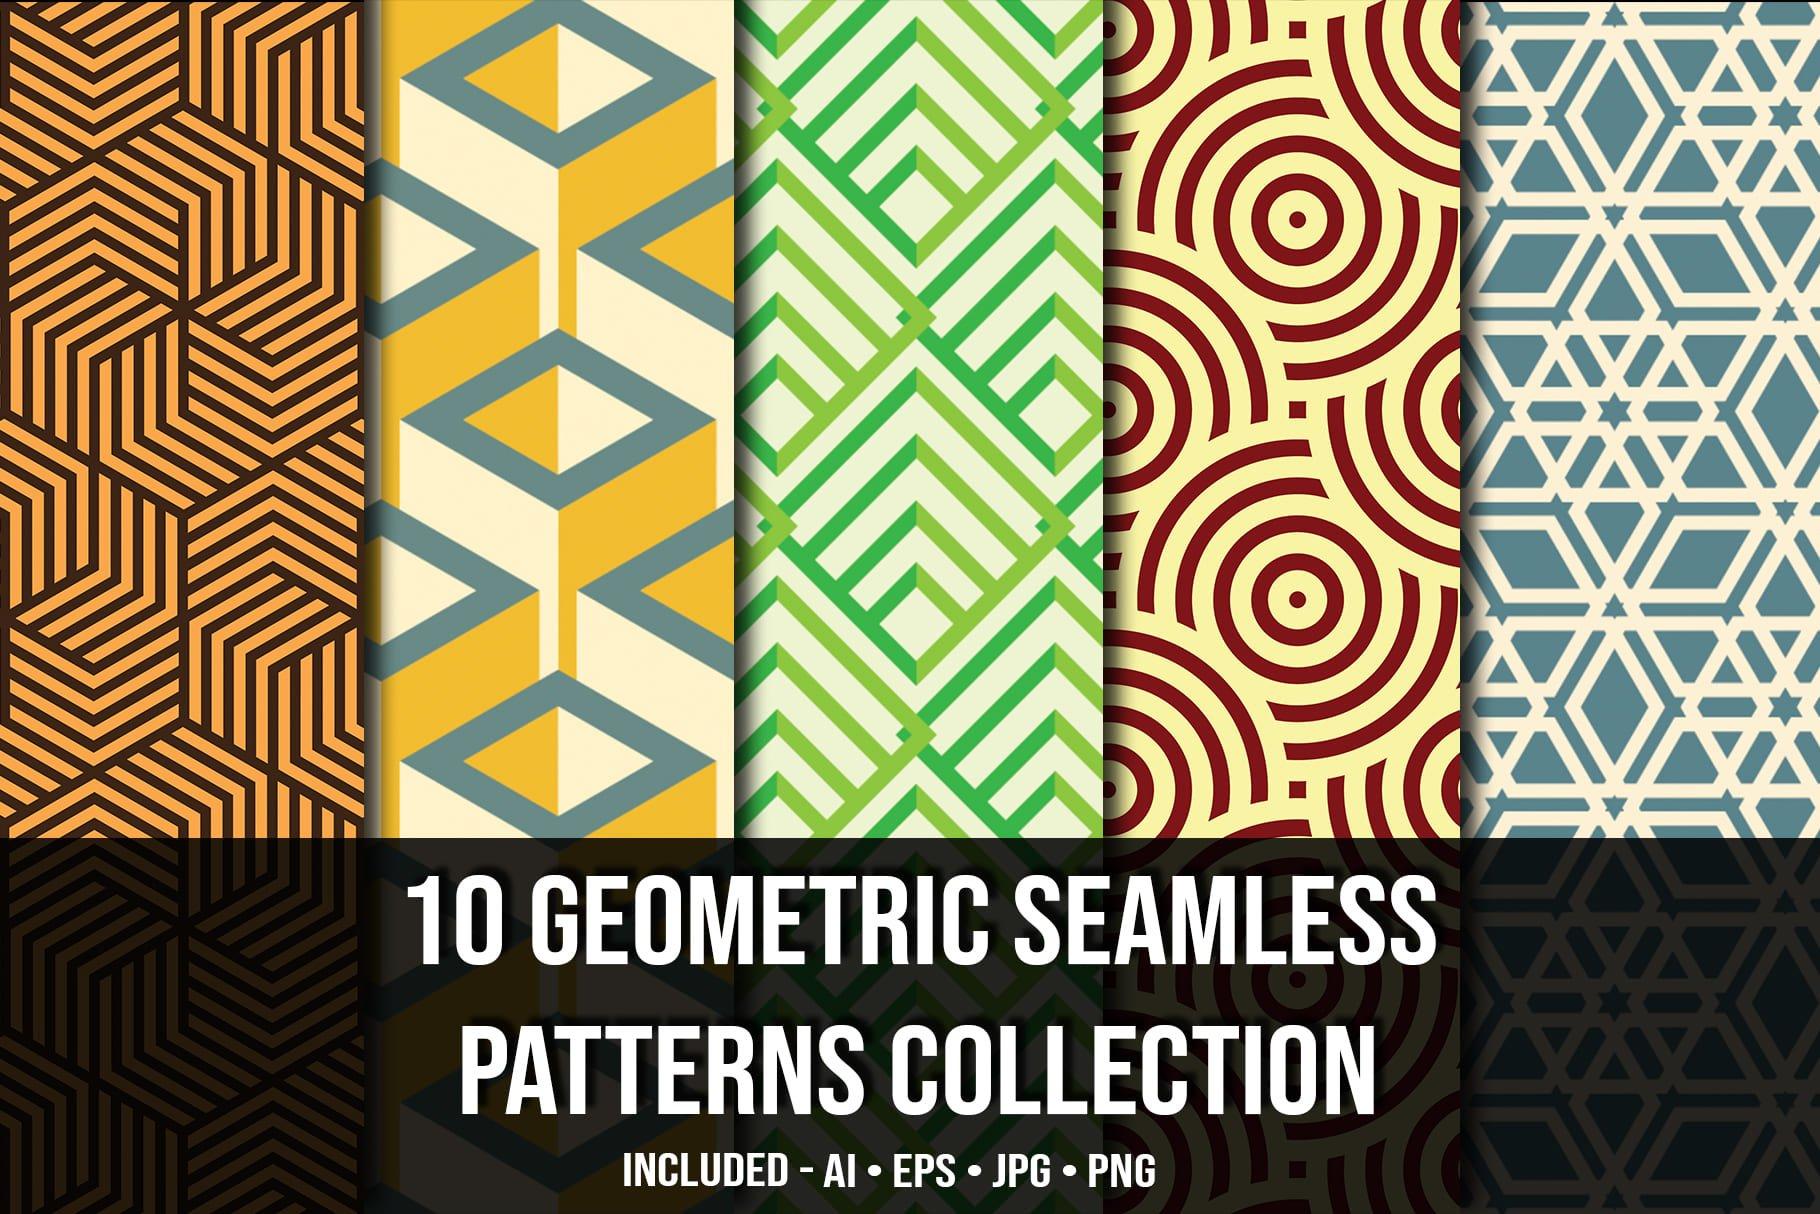 Main image.Geometric Seamless Patterns Collection.